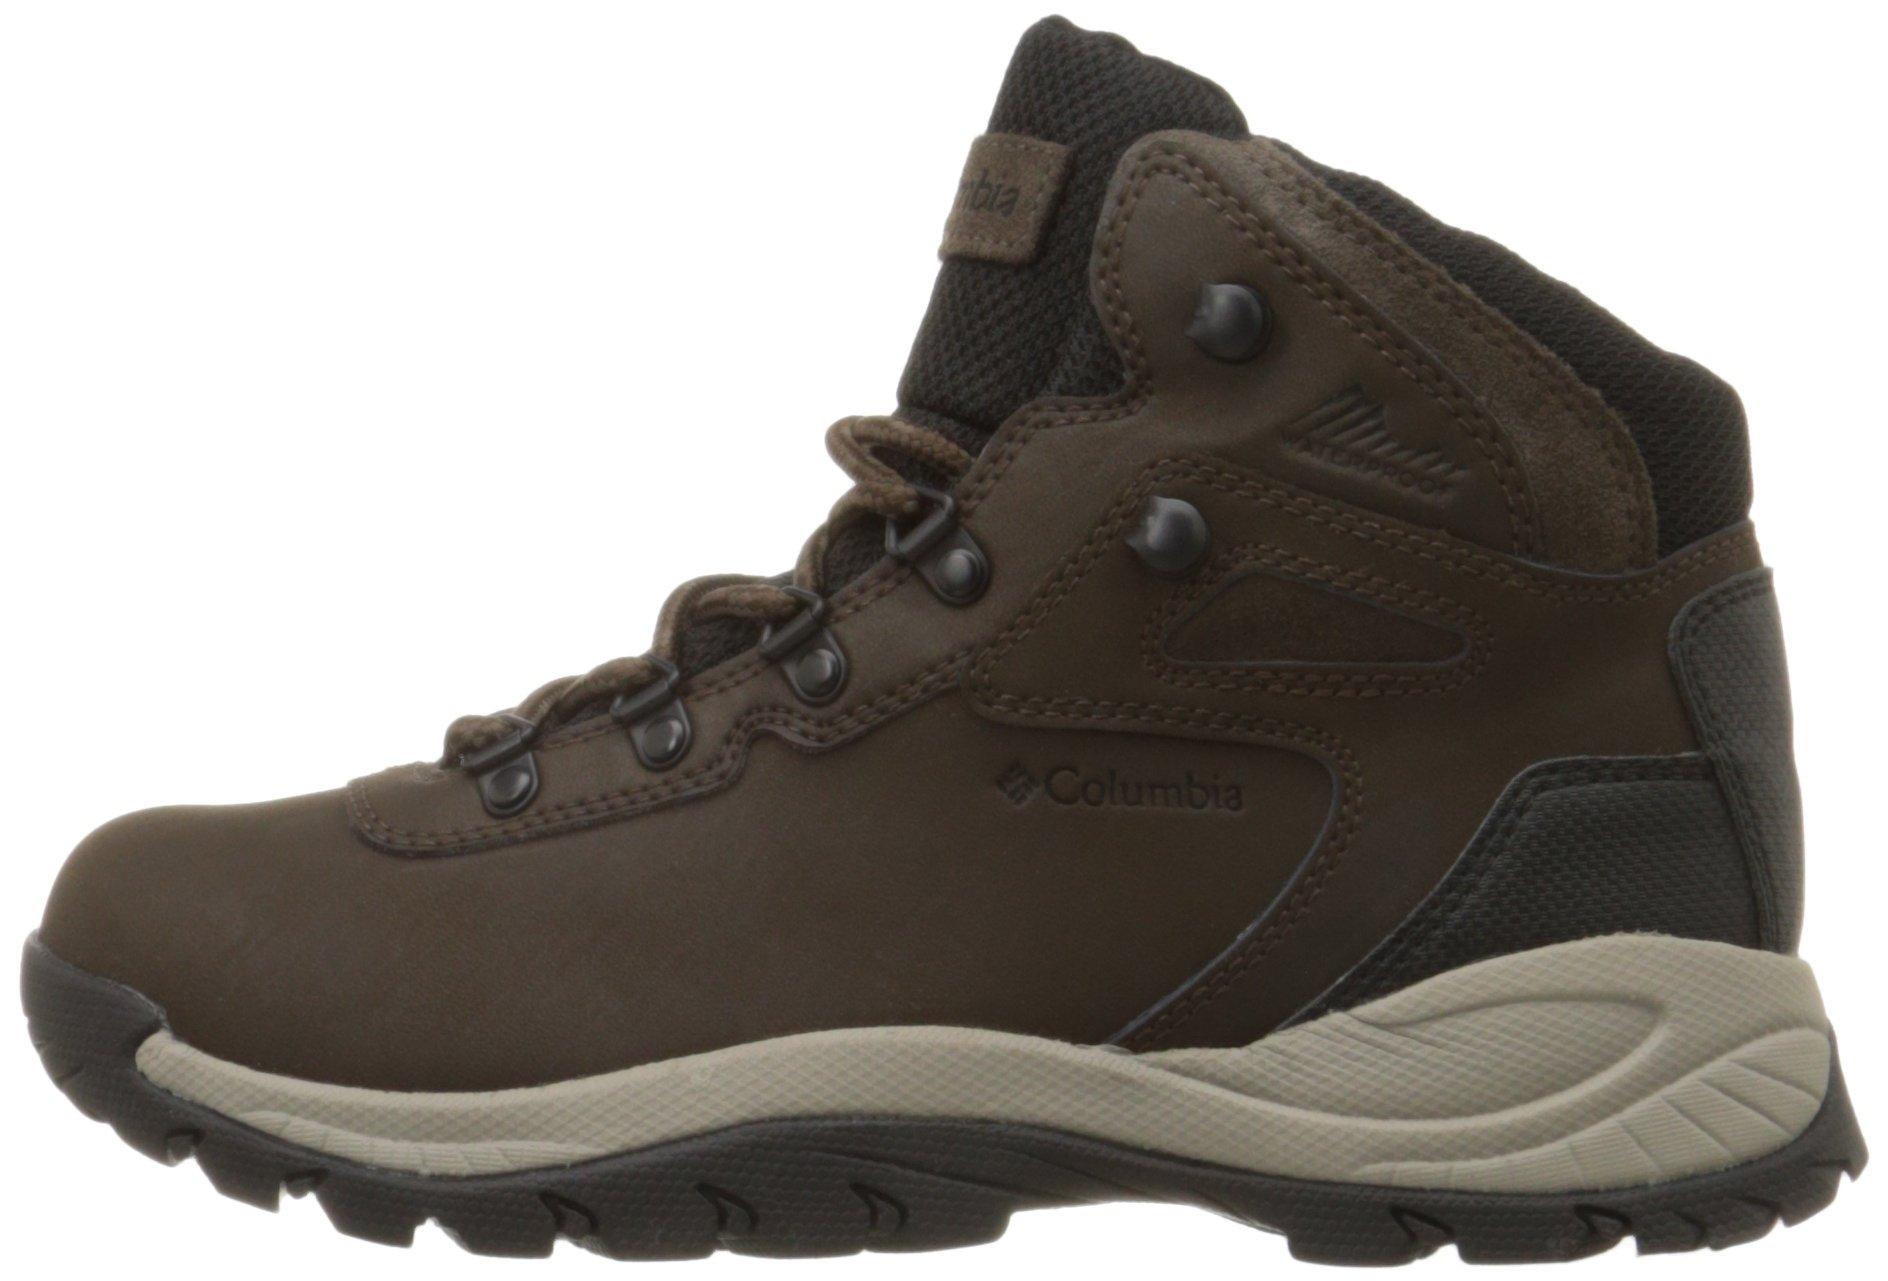 Columbia Women's Newton Ridge Plus Hiking Boot, Cordovan/Crown Jewel, 6 Regular US by Columbia (Image #5)